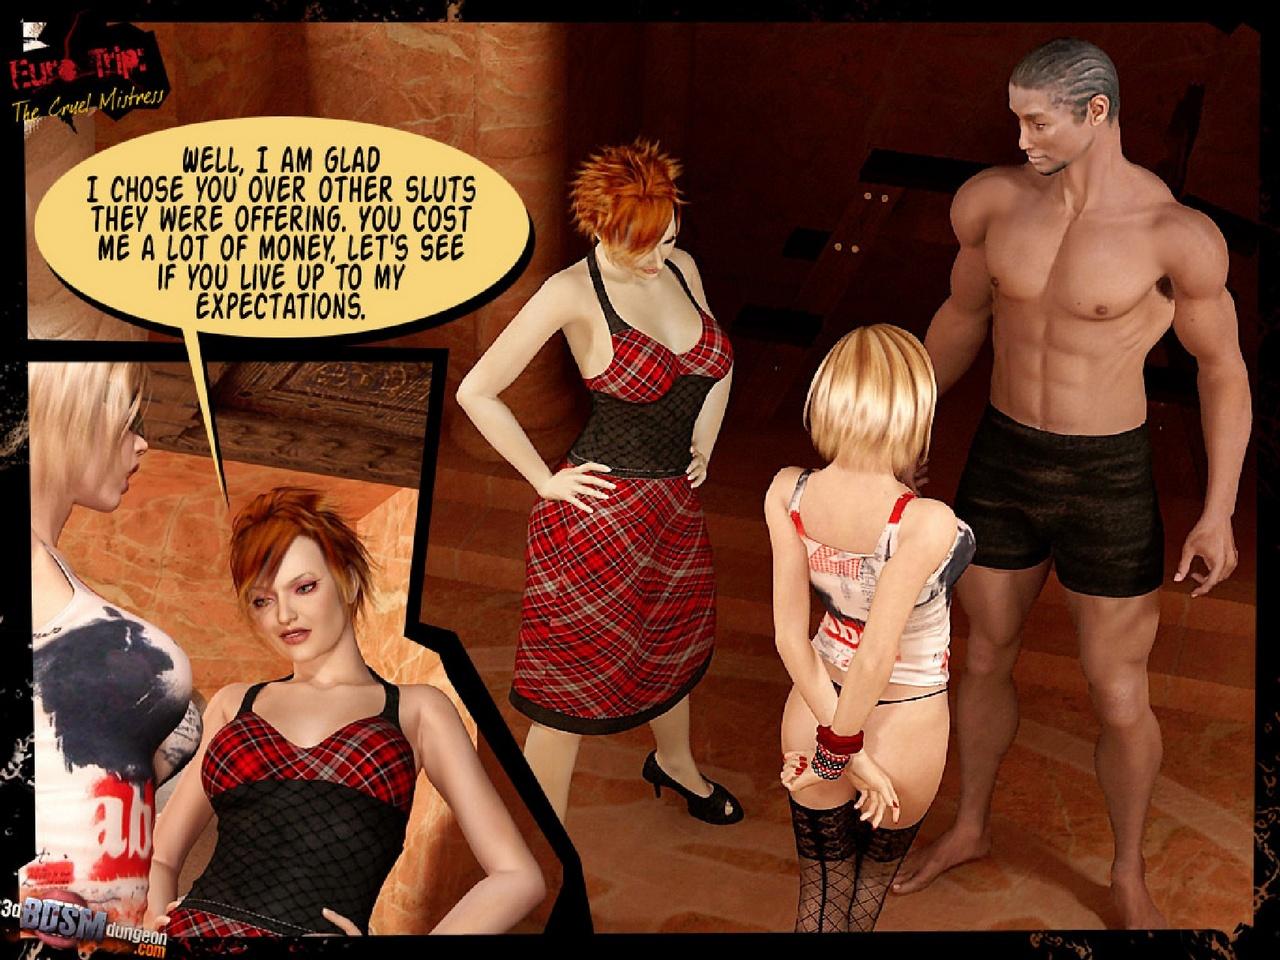 Euro Trip 3 - The Cruel Mistress